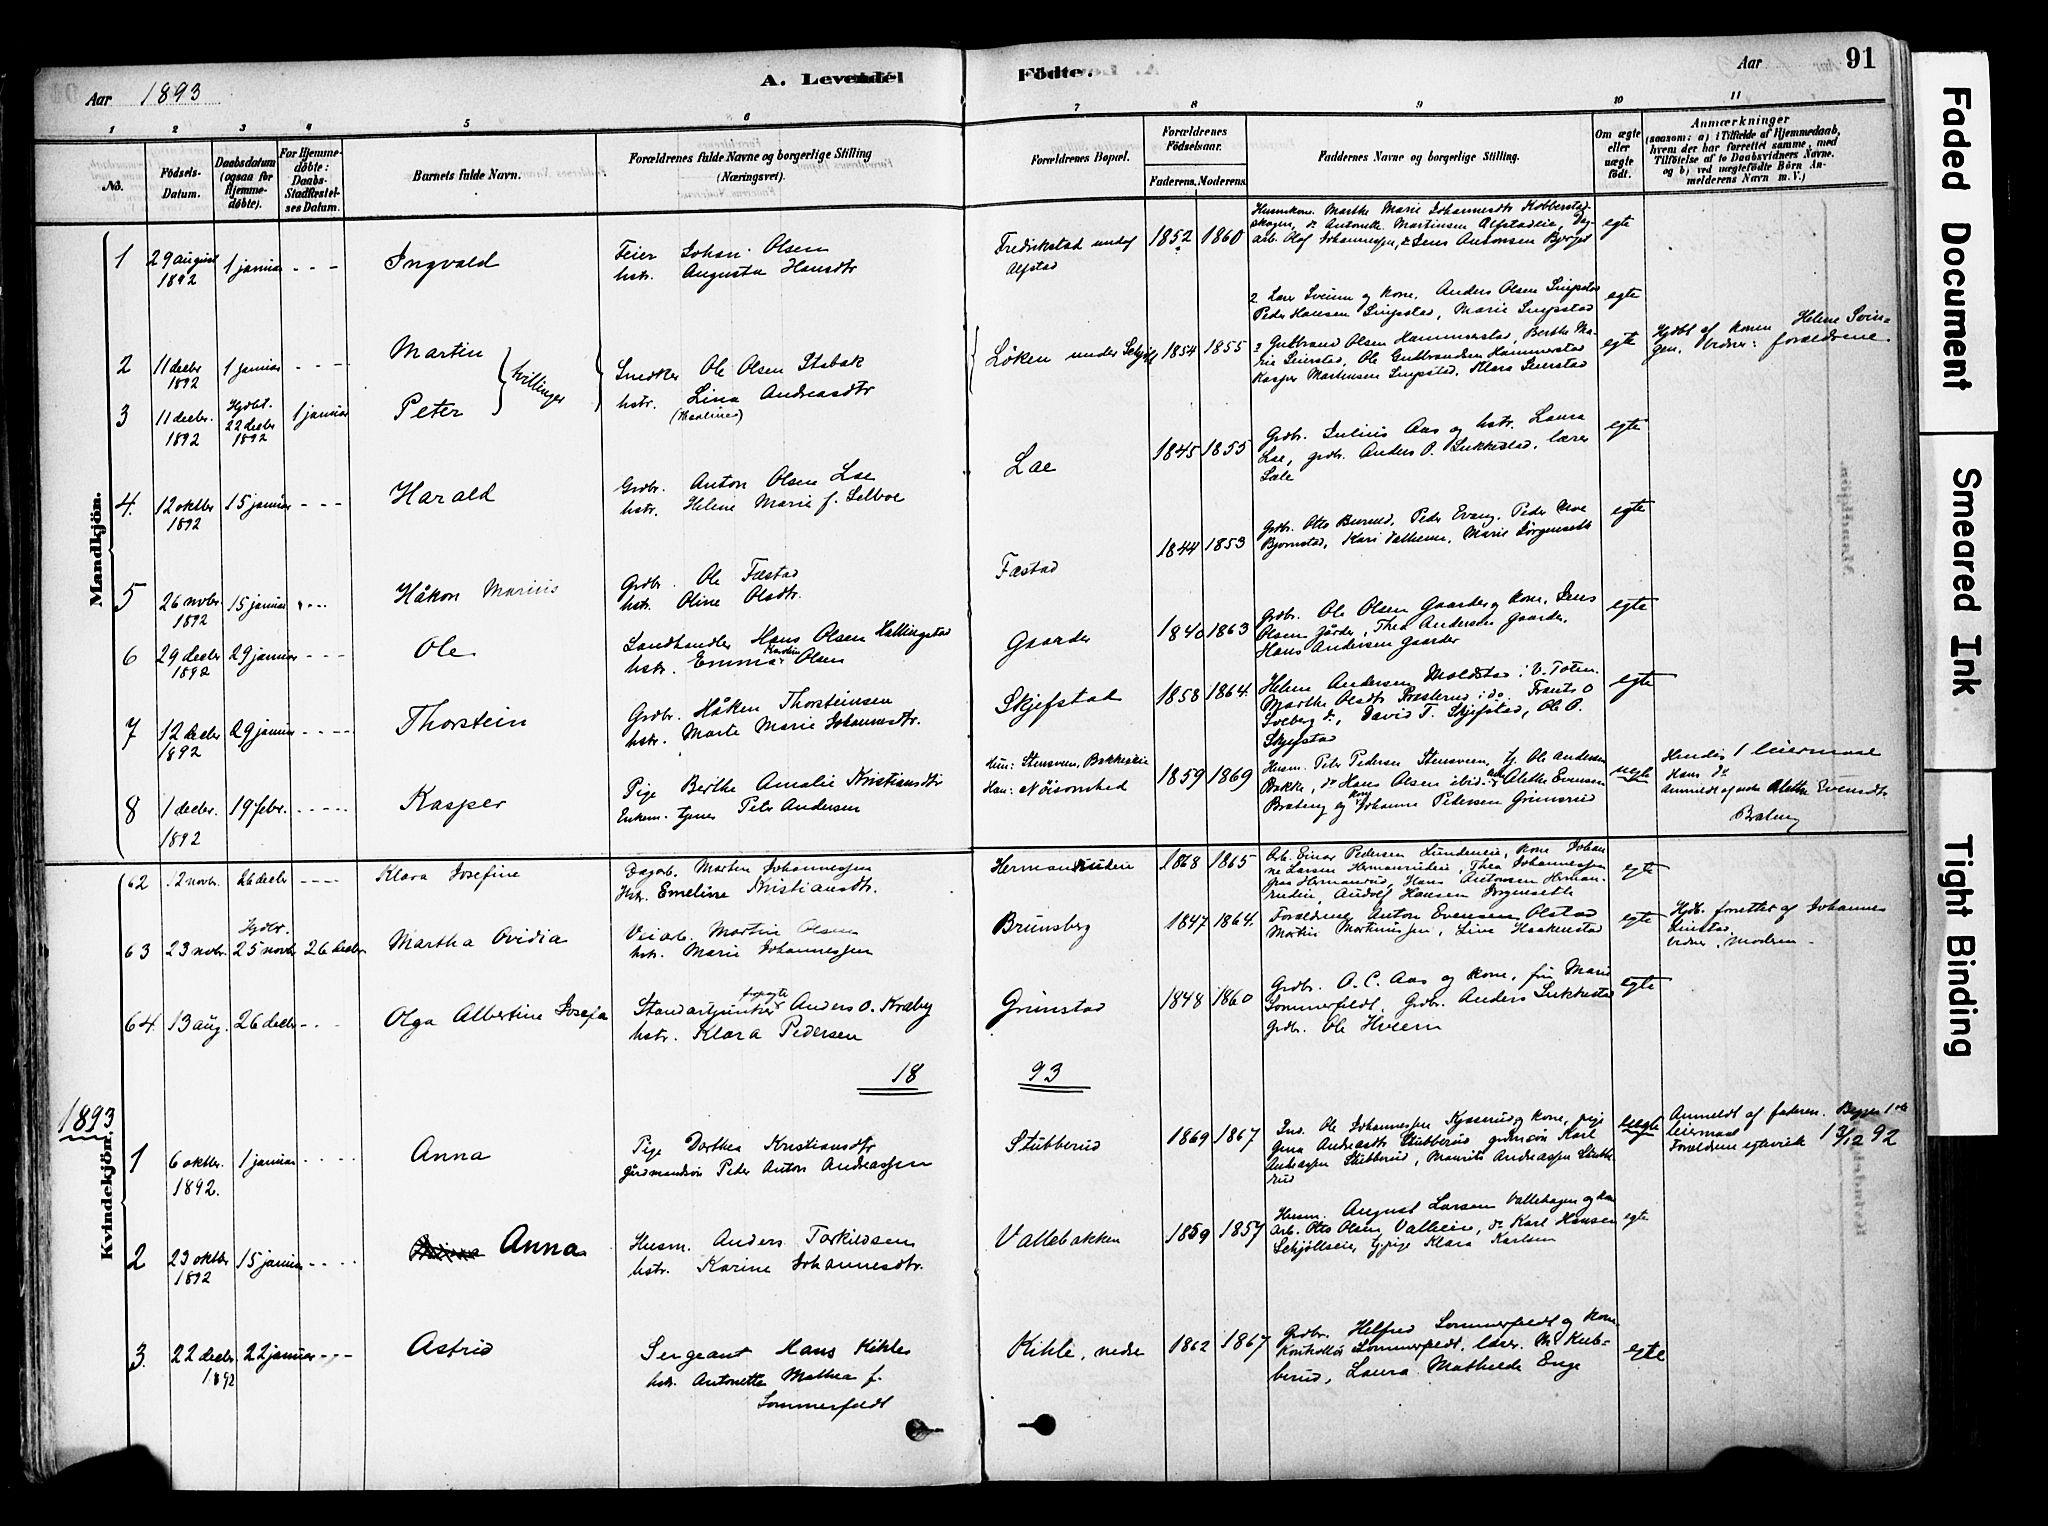 SAH, Østre Toten prestekontor, Ministerialbok nr. 6 /1, 1878-1896, s. 91